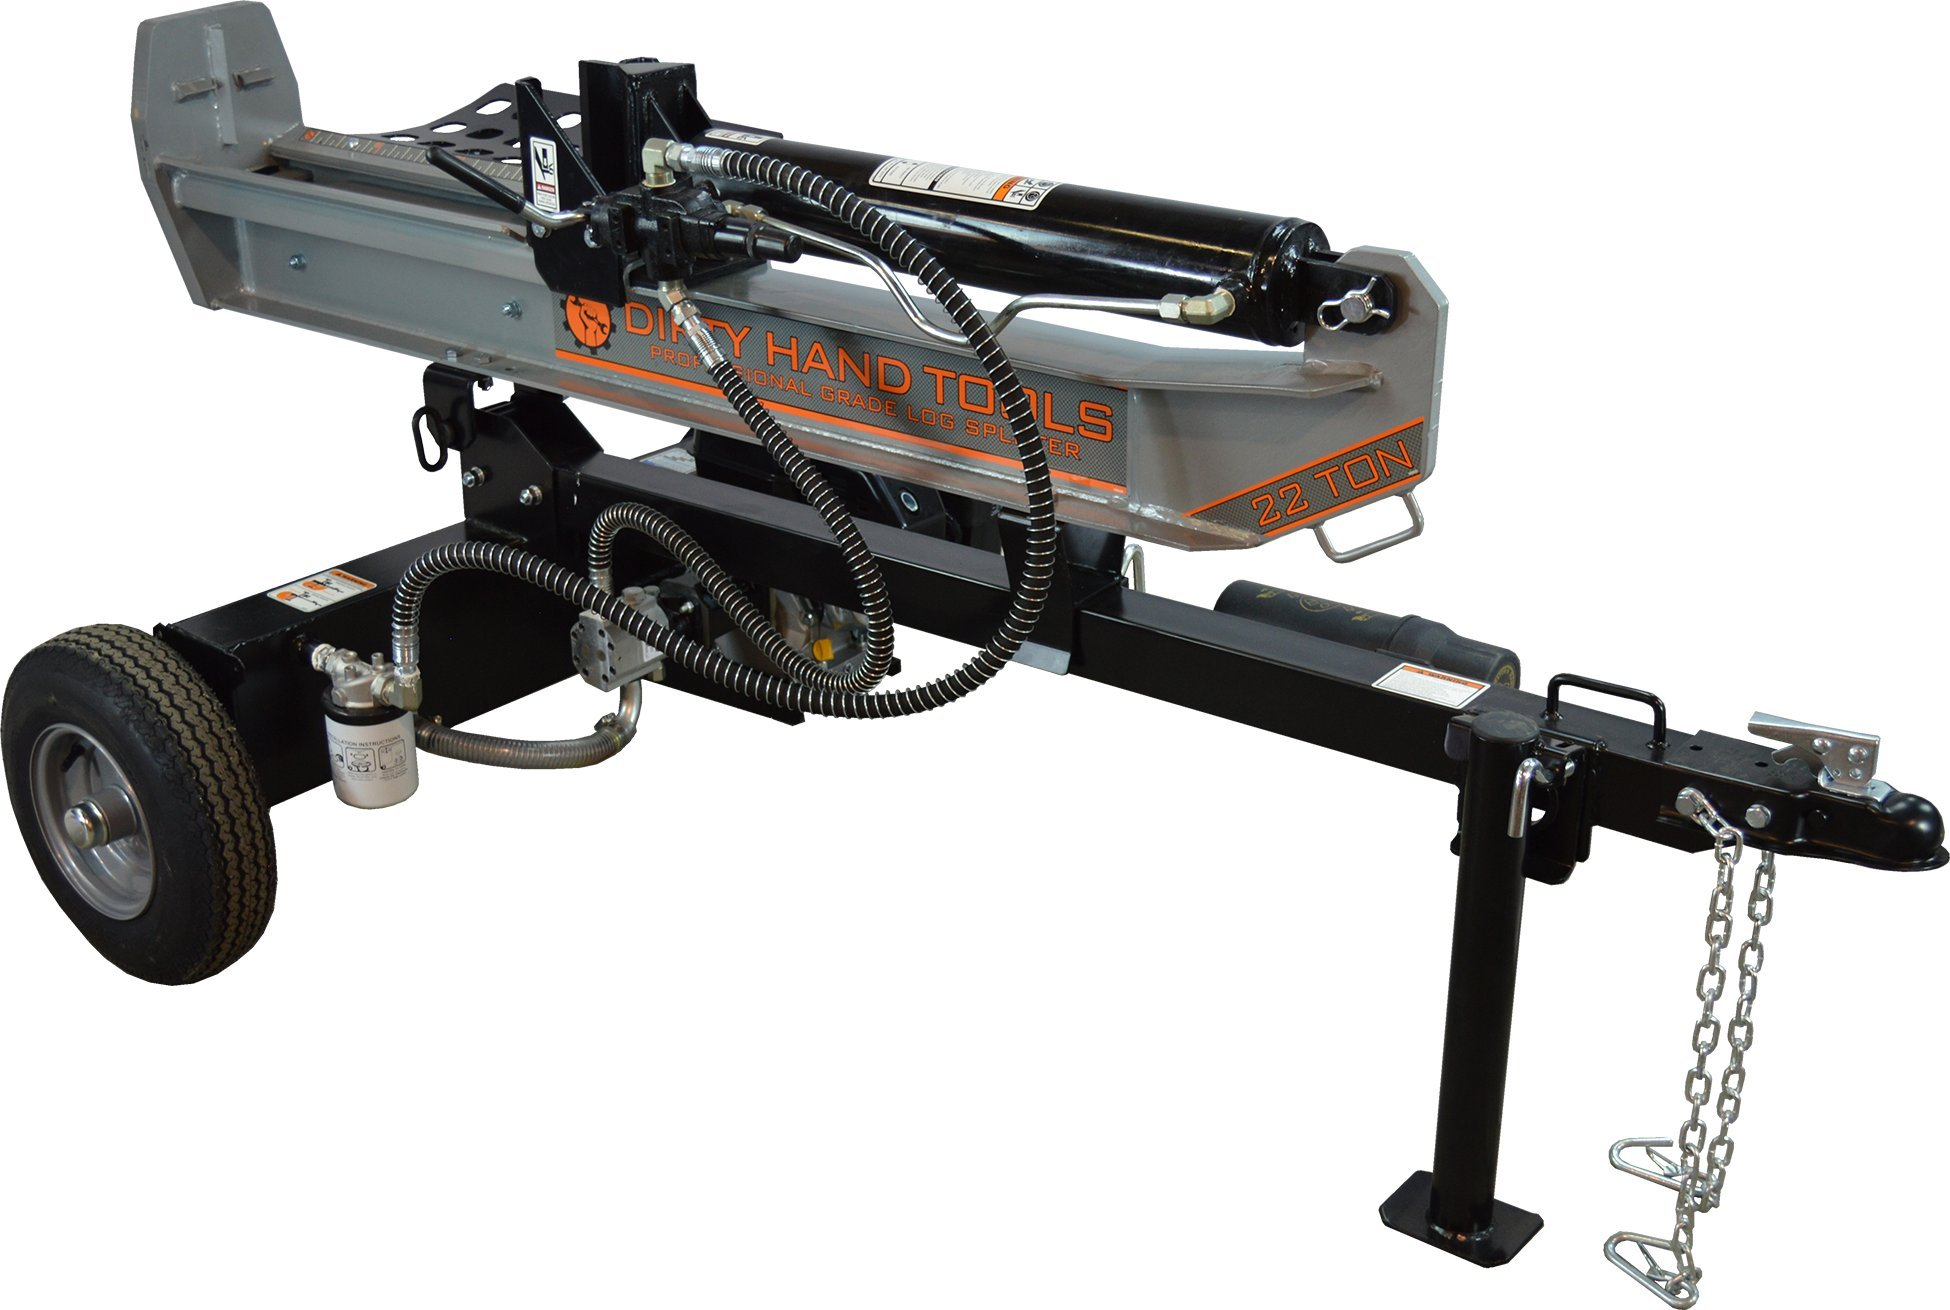 Dirty Hand Tools 100171, 22 Ton Horizontal/Vertical Gas Log Splitter, 196cc Kohler SH265 Engine